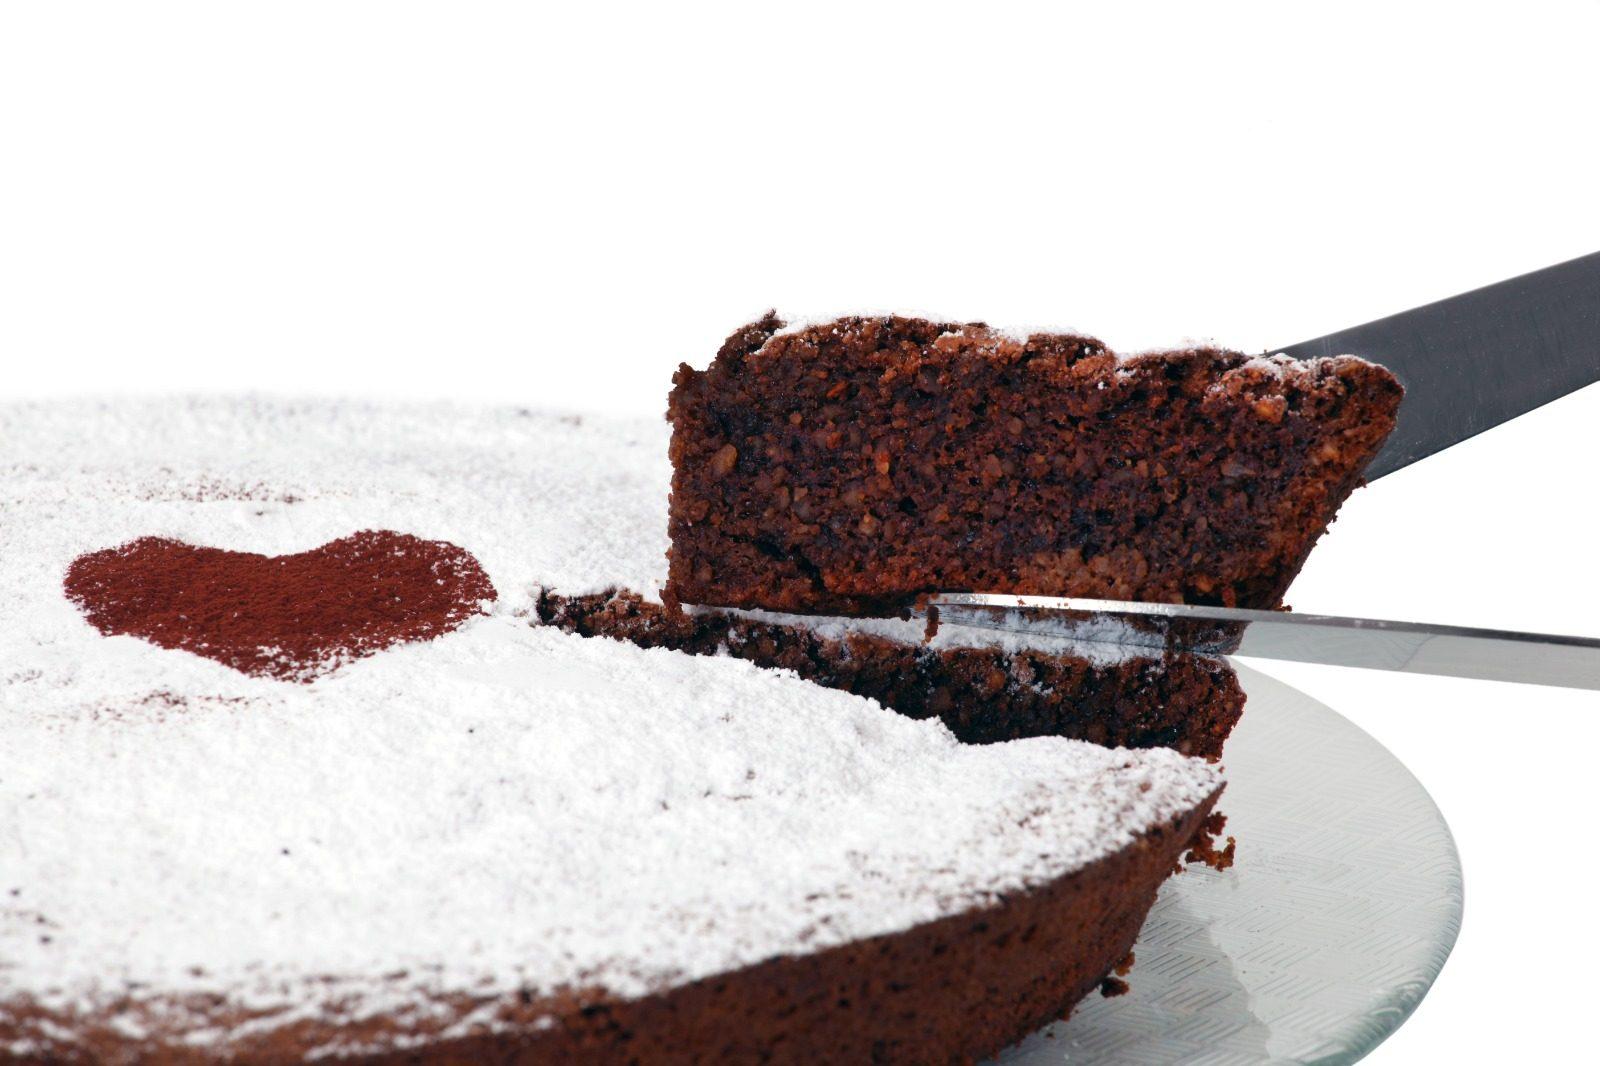 La storia della torta caprese, tra Maria Carolina d'Asburgo e Al Capone